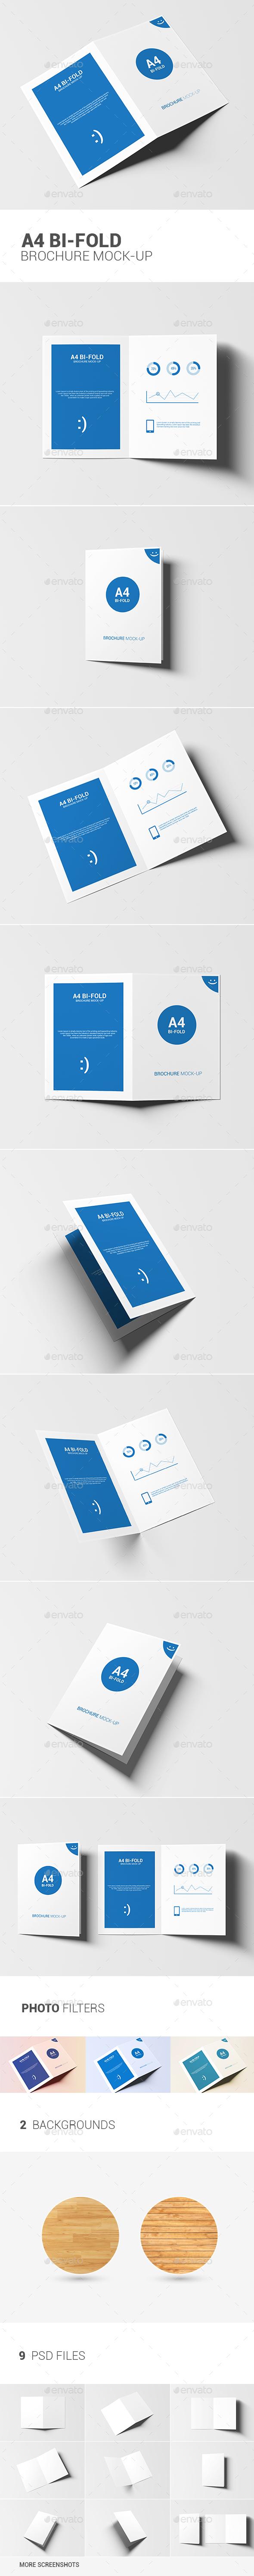 A4 Bi-fold Brochure Mock-Up - Brochures Print